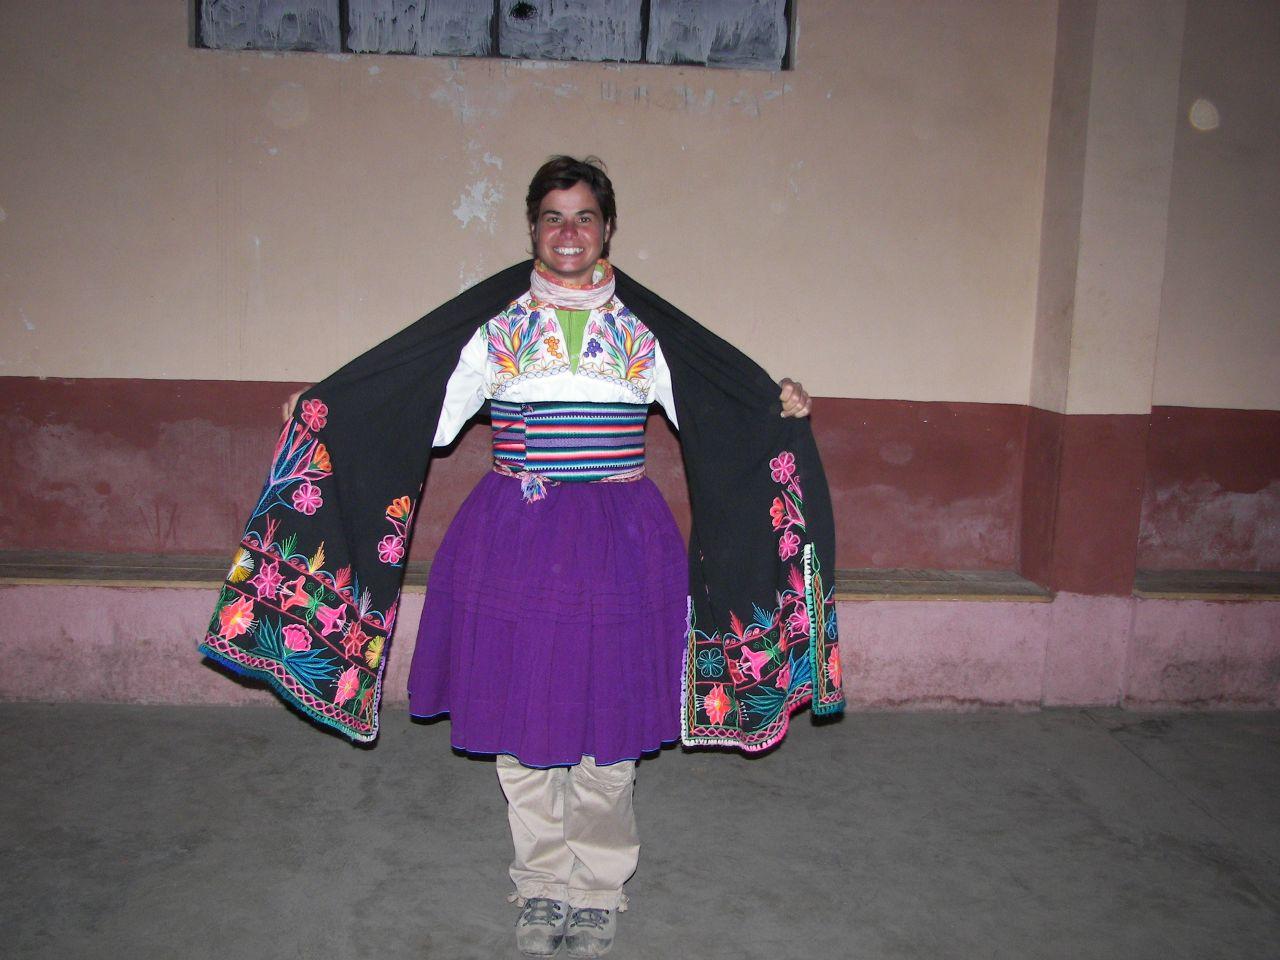 aventuras30: Colca. Arequipa. Puno e islas. Ultimos dias en Peru.